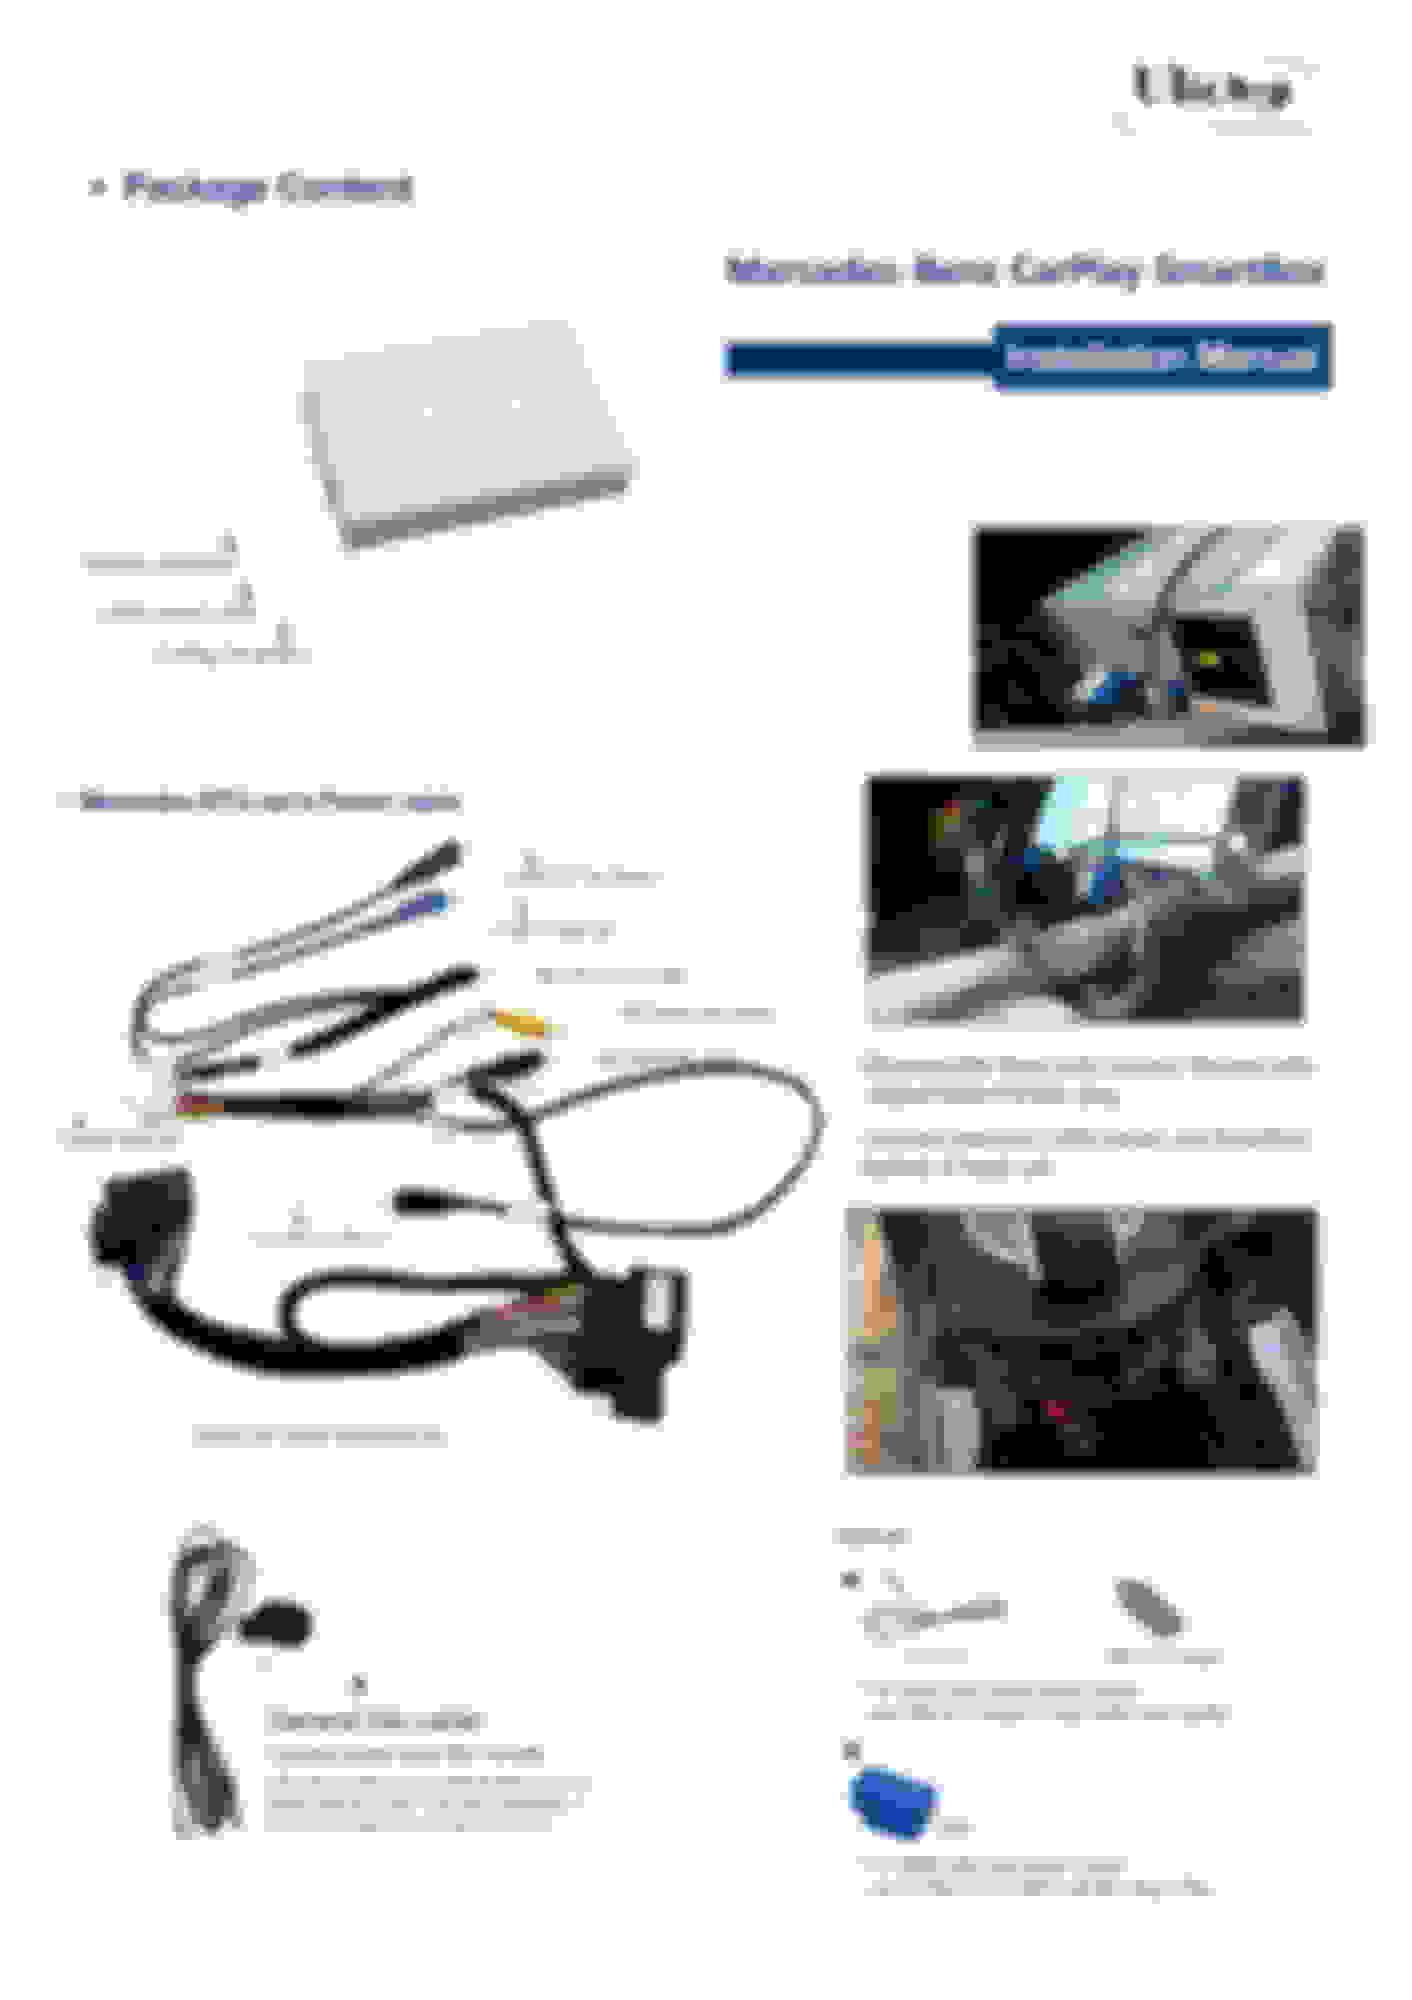 2017 GLC 300 CarPlay retrofit? - MBWorld org Forums